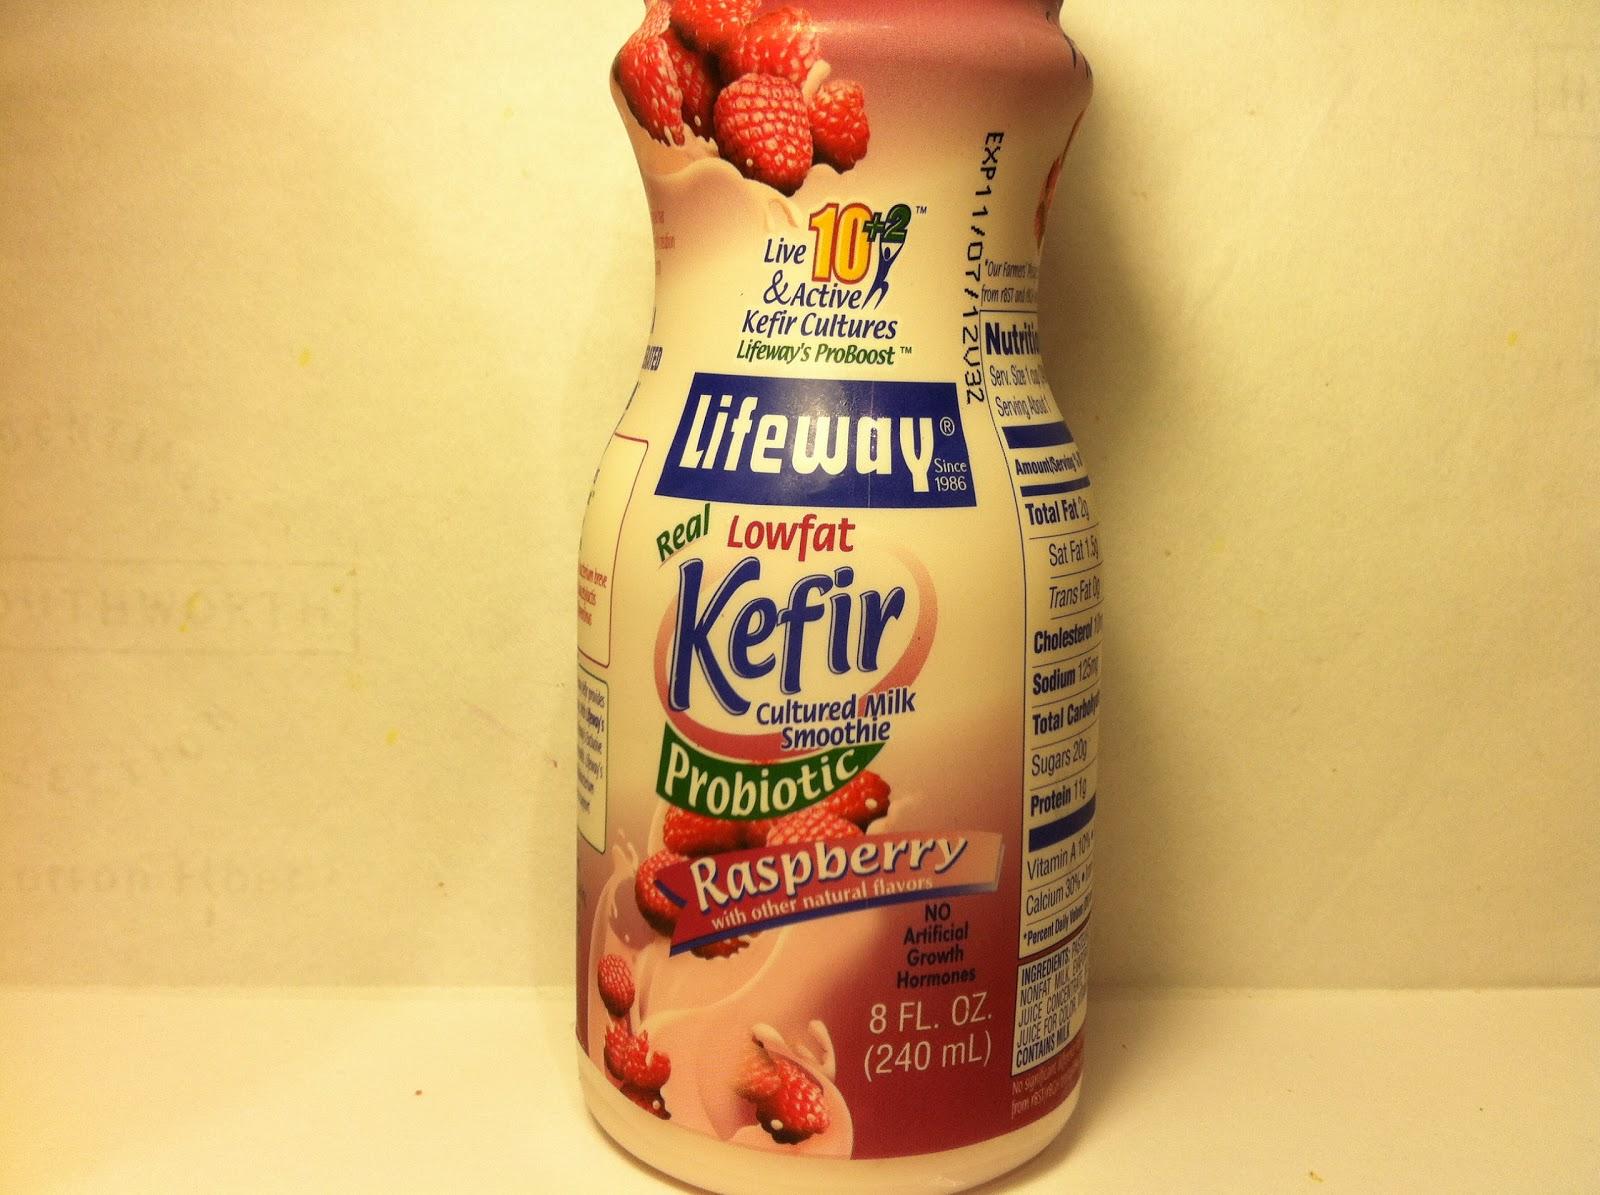 Probiotic smoothie benefits 811